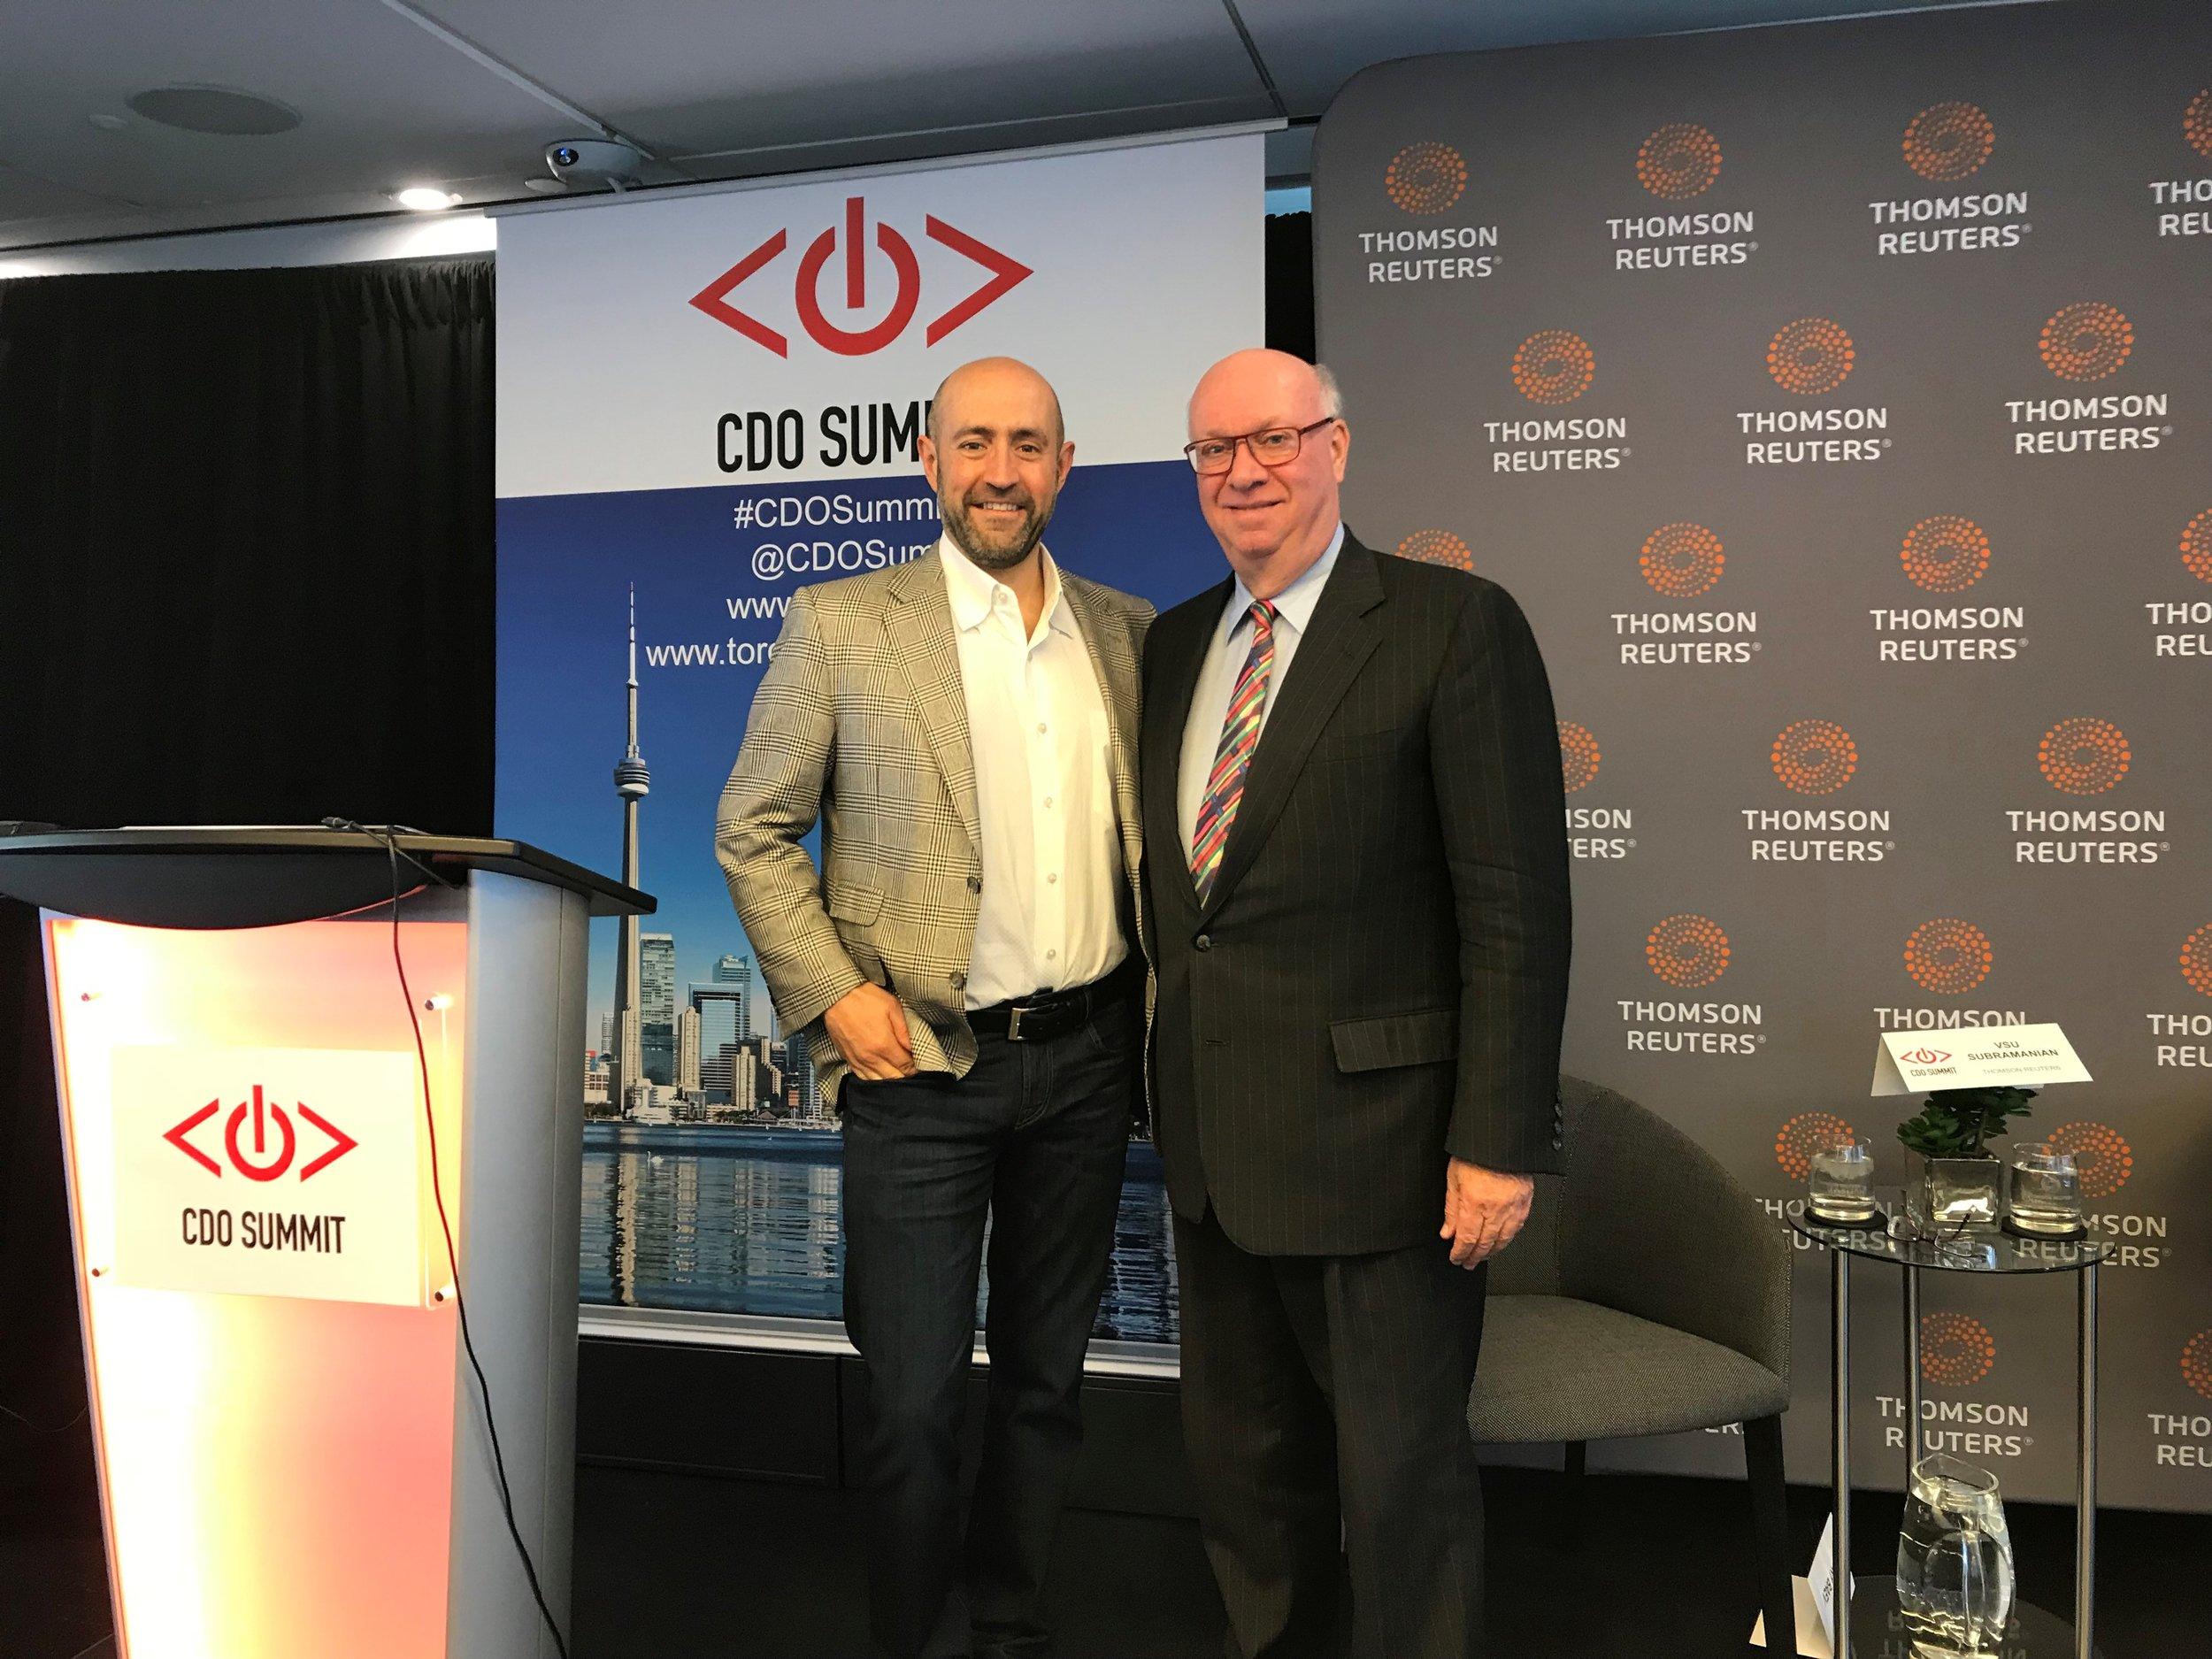 20171221 Jay Rosenzweig with Partner Robert Waite at Groundbreaking CDO Summit.jpg